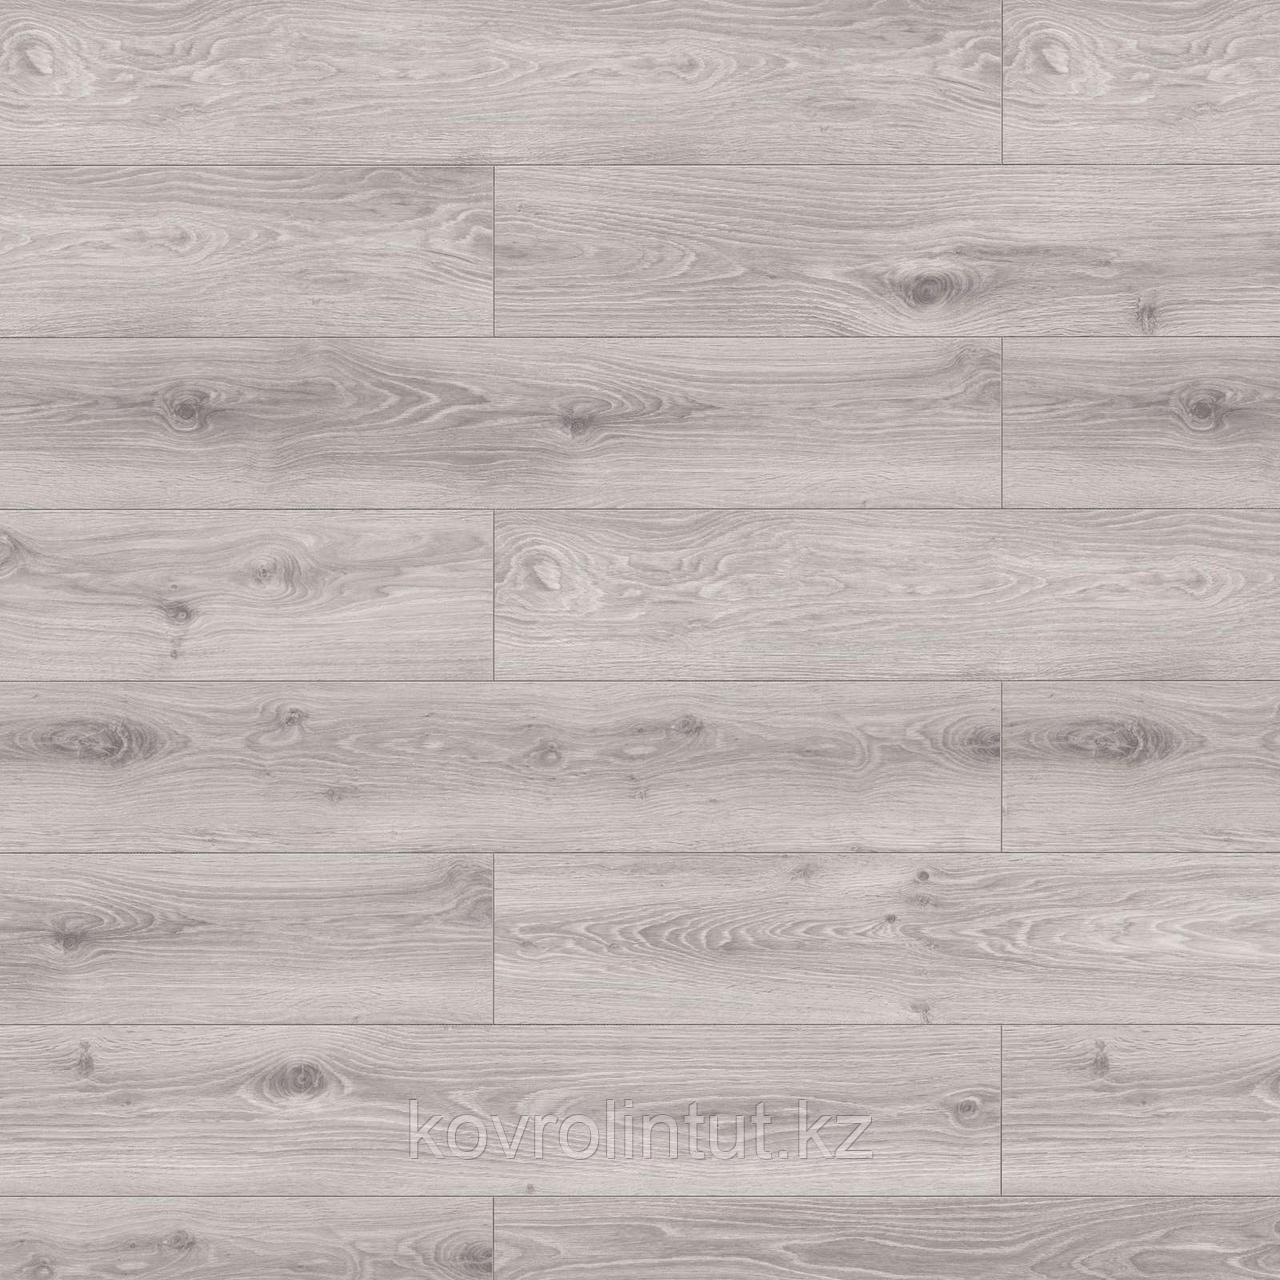 Ламинат Classen Discovery Argenta Oak Grey